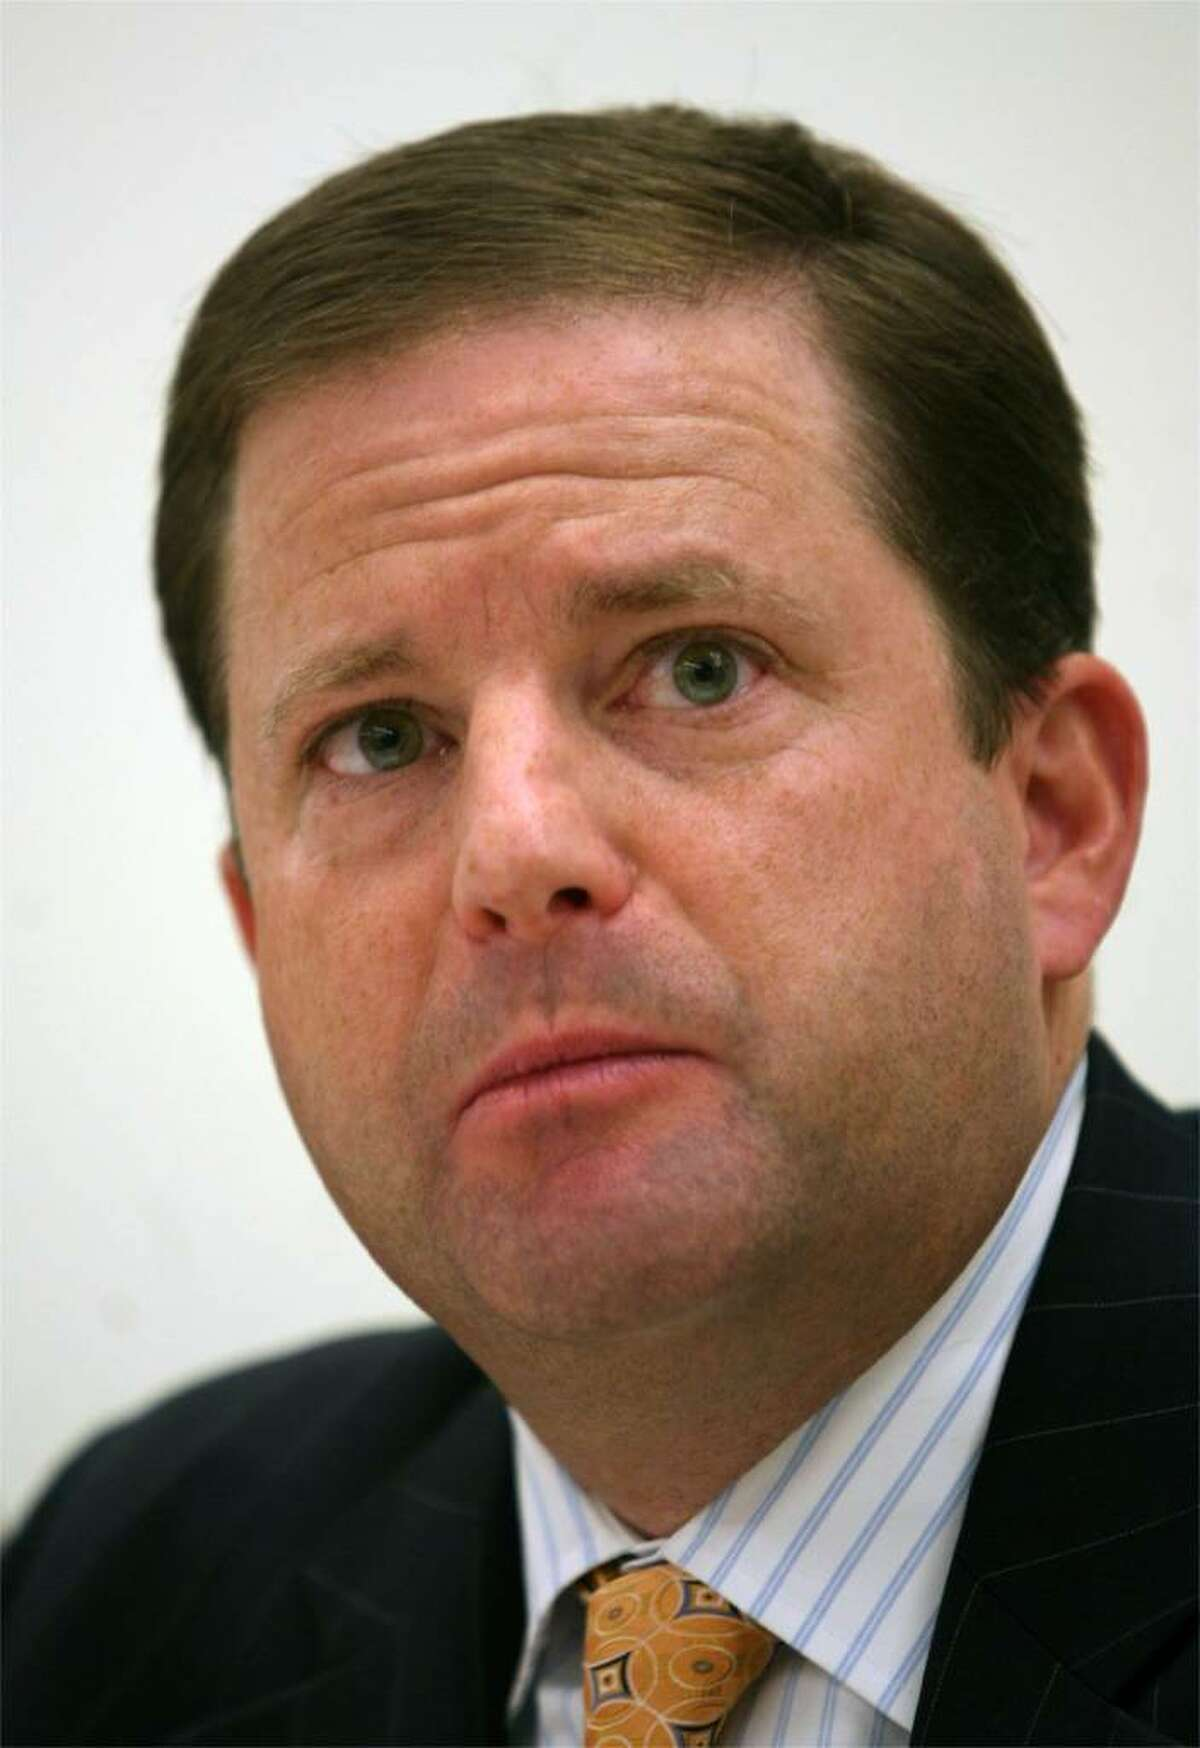 State Senator John McKinney R-28